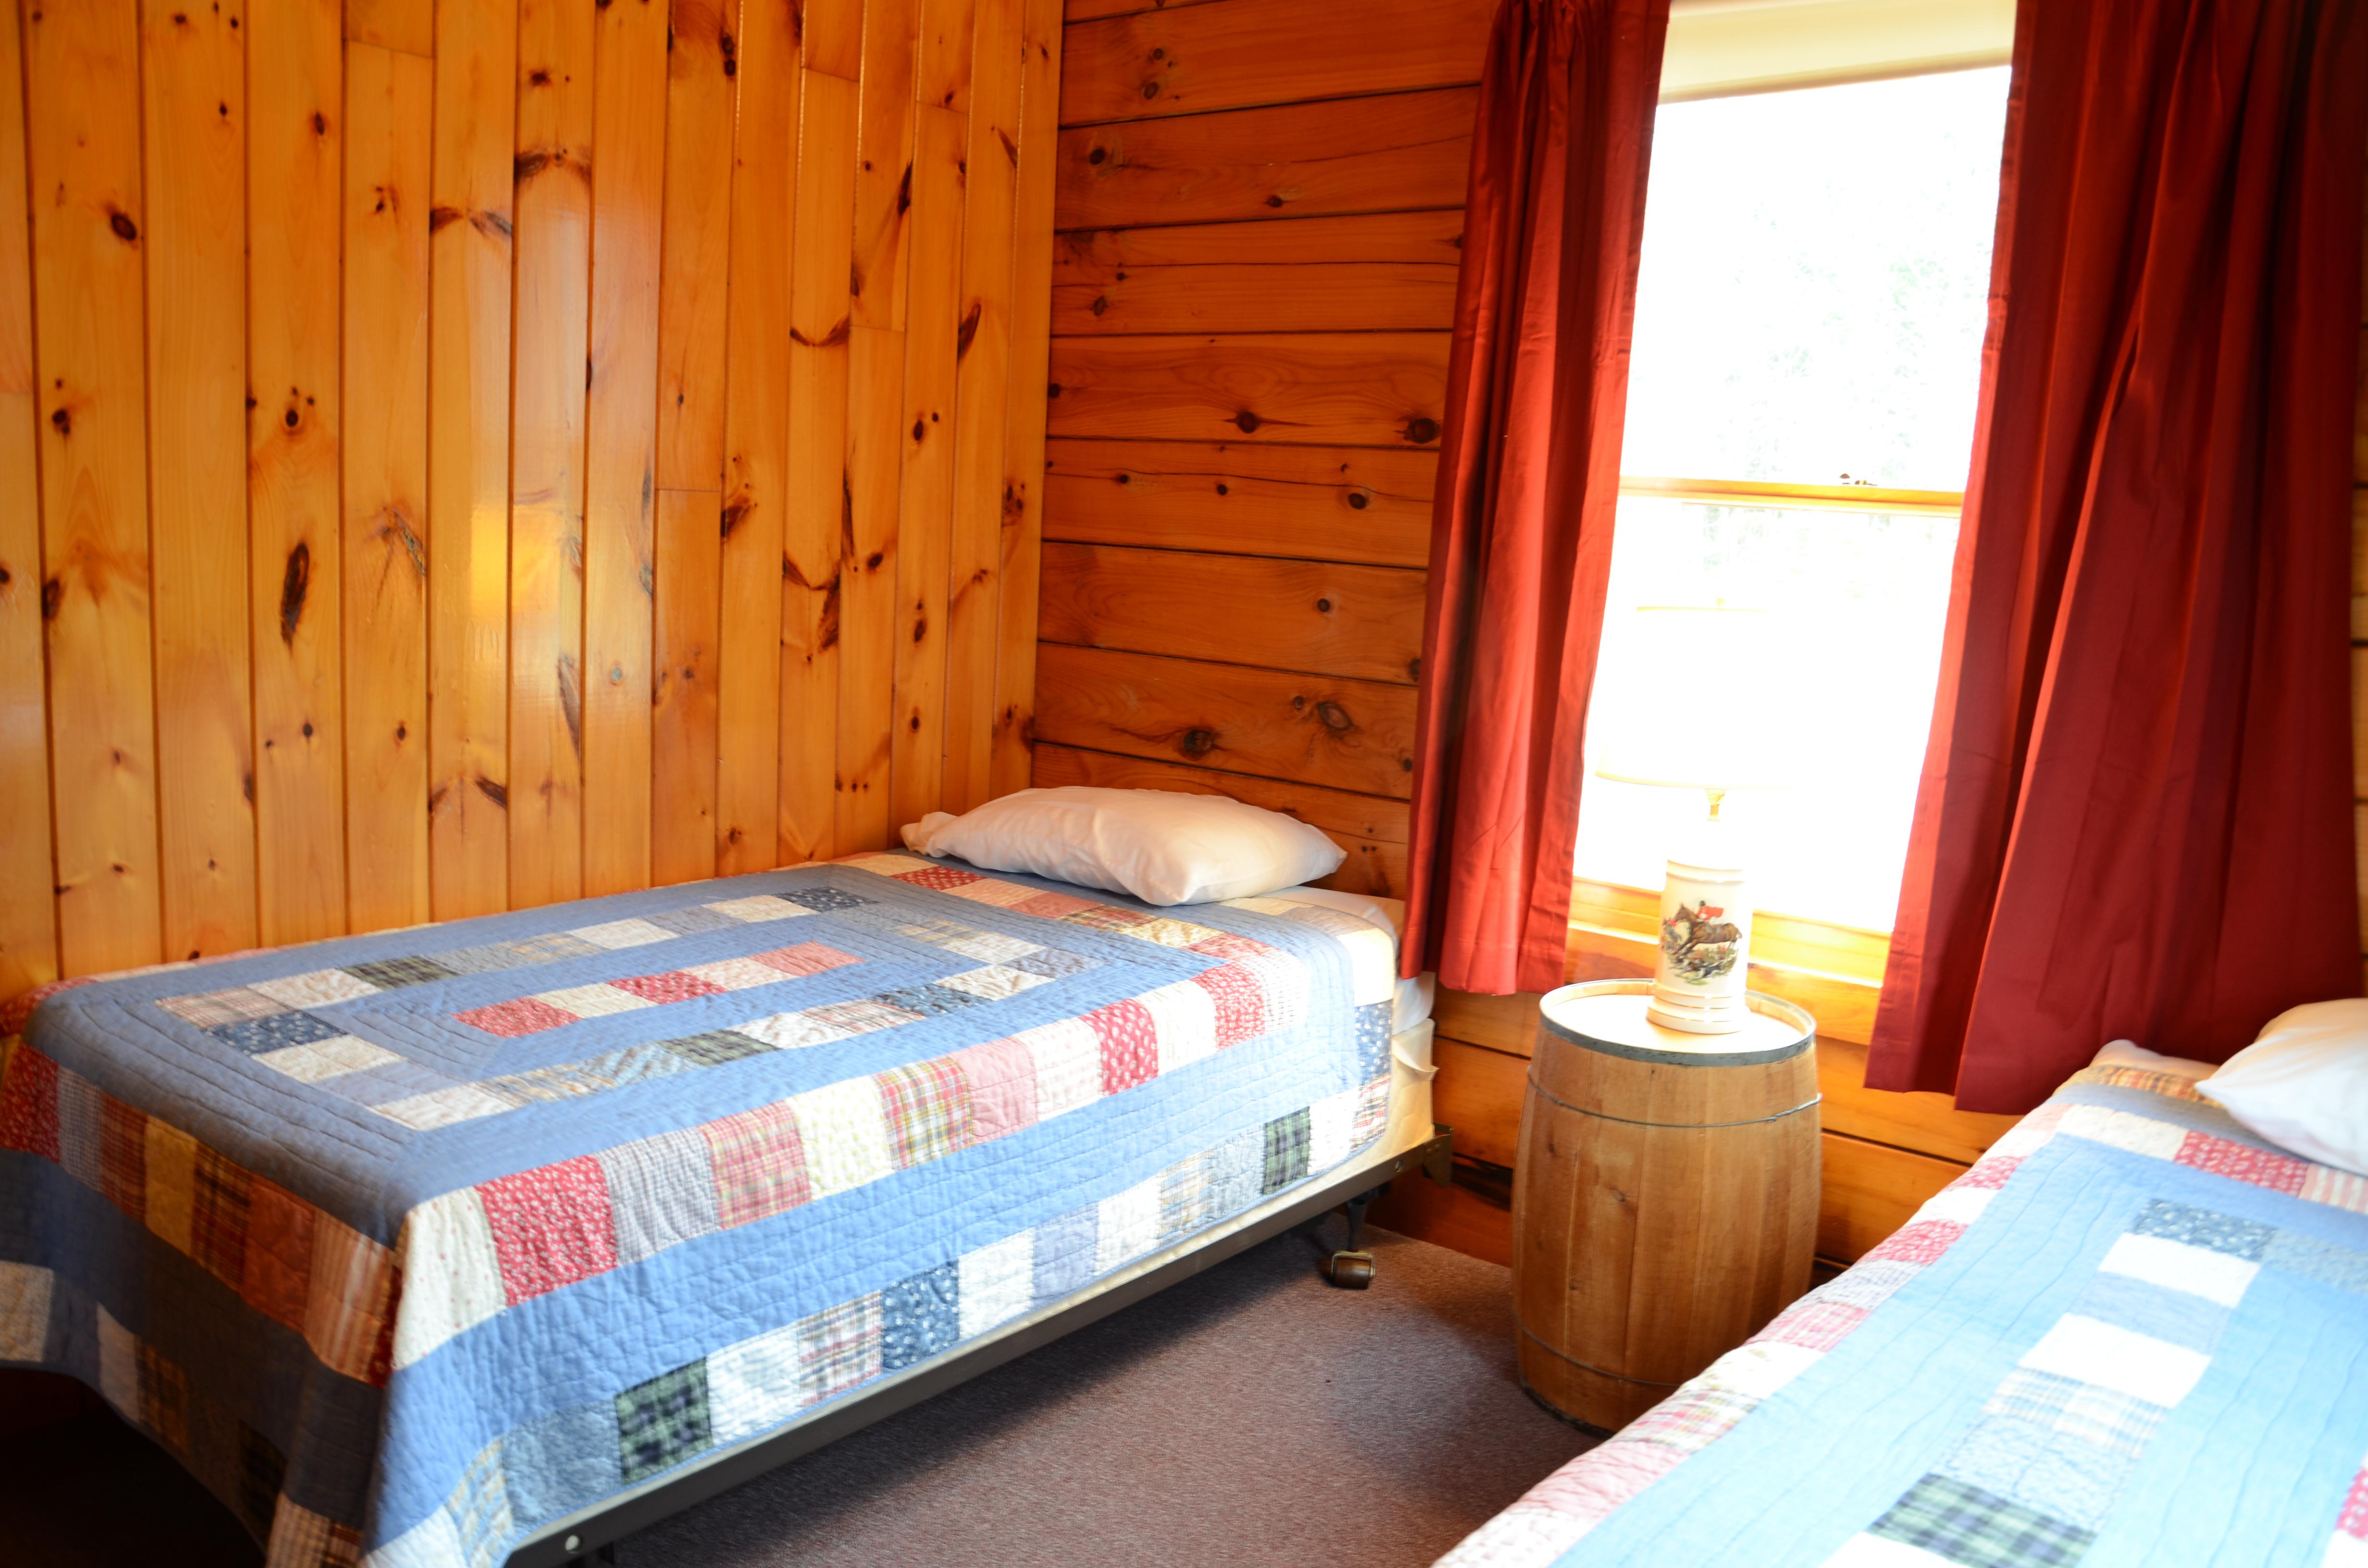 3 bedroom log cabin on first connecticut lake with firepit for 3 bedroom log cabin